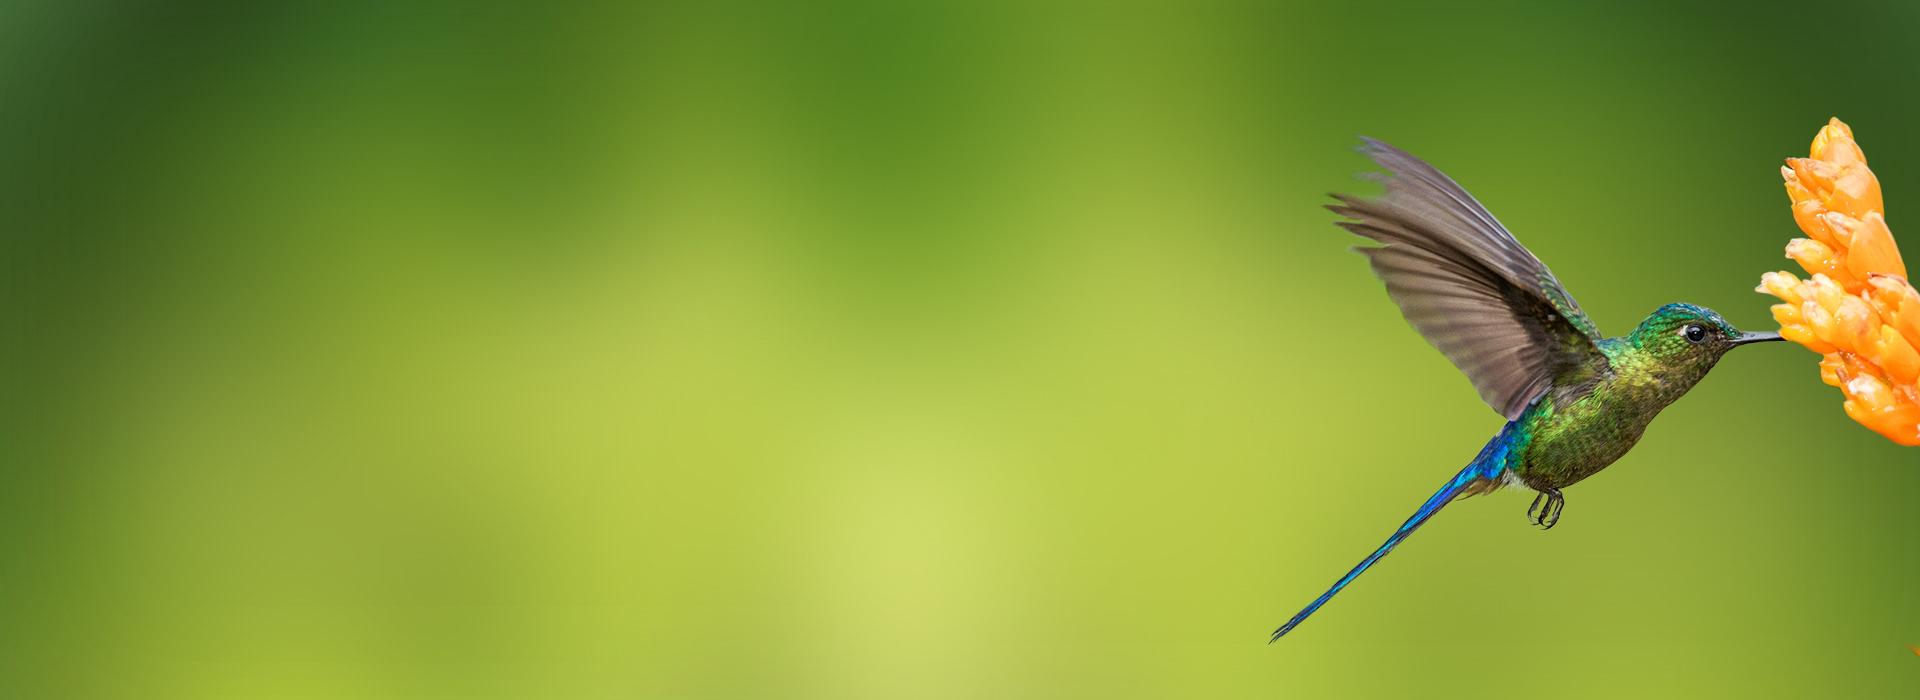 kolibri an orangener blüte